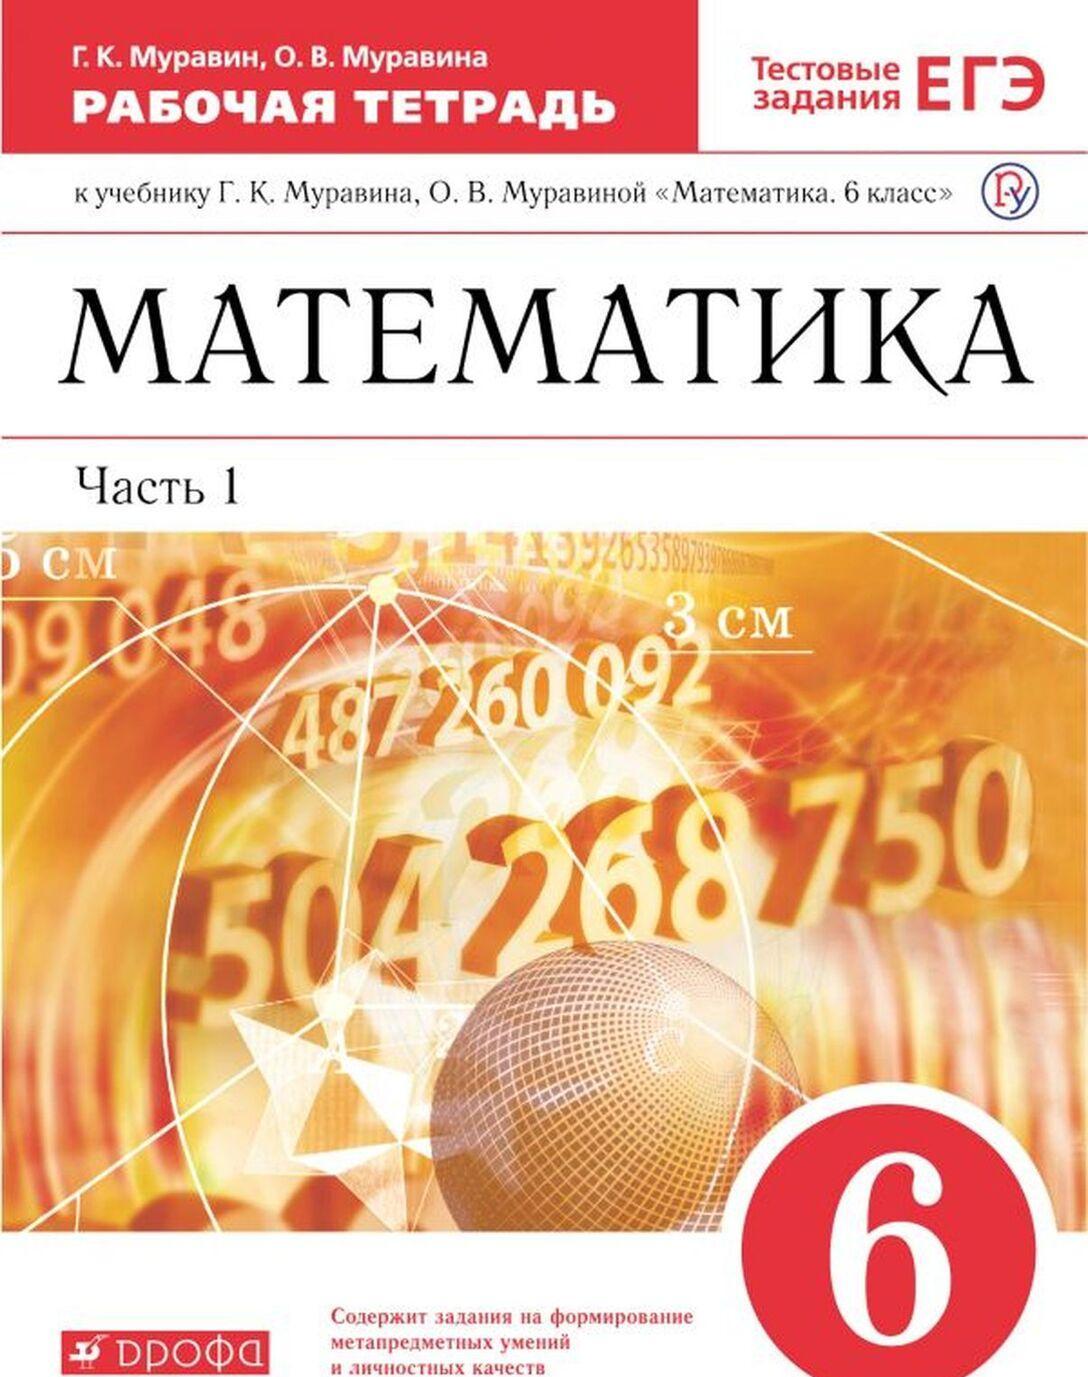 Matematika. 6 klass. Rabochaja tetrad. K uchebniku G. K. Muravina, O. V. Muravinoj. V 2-kh chastjakh. Chast 1